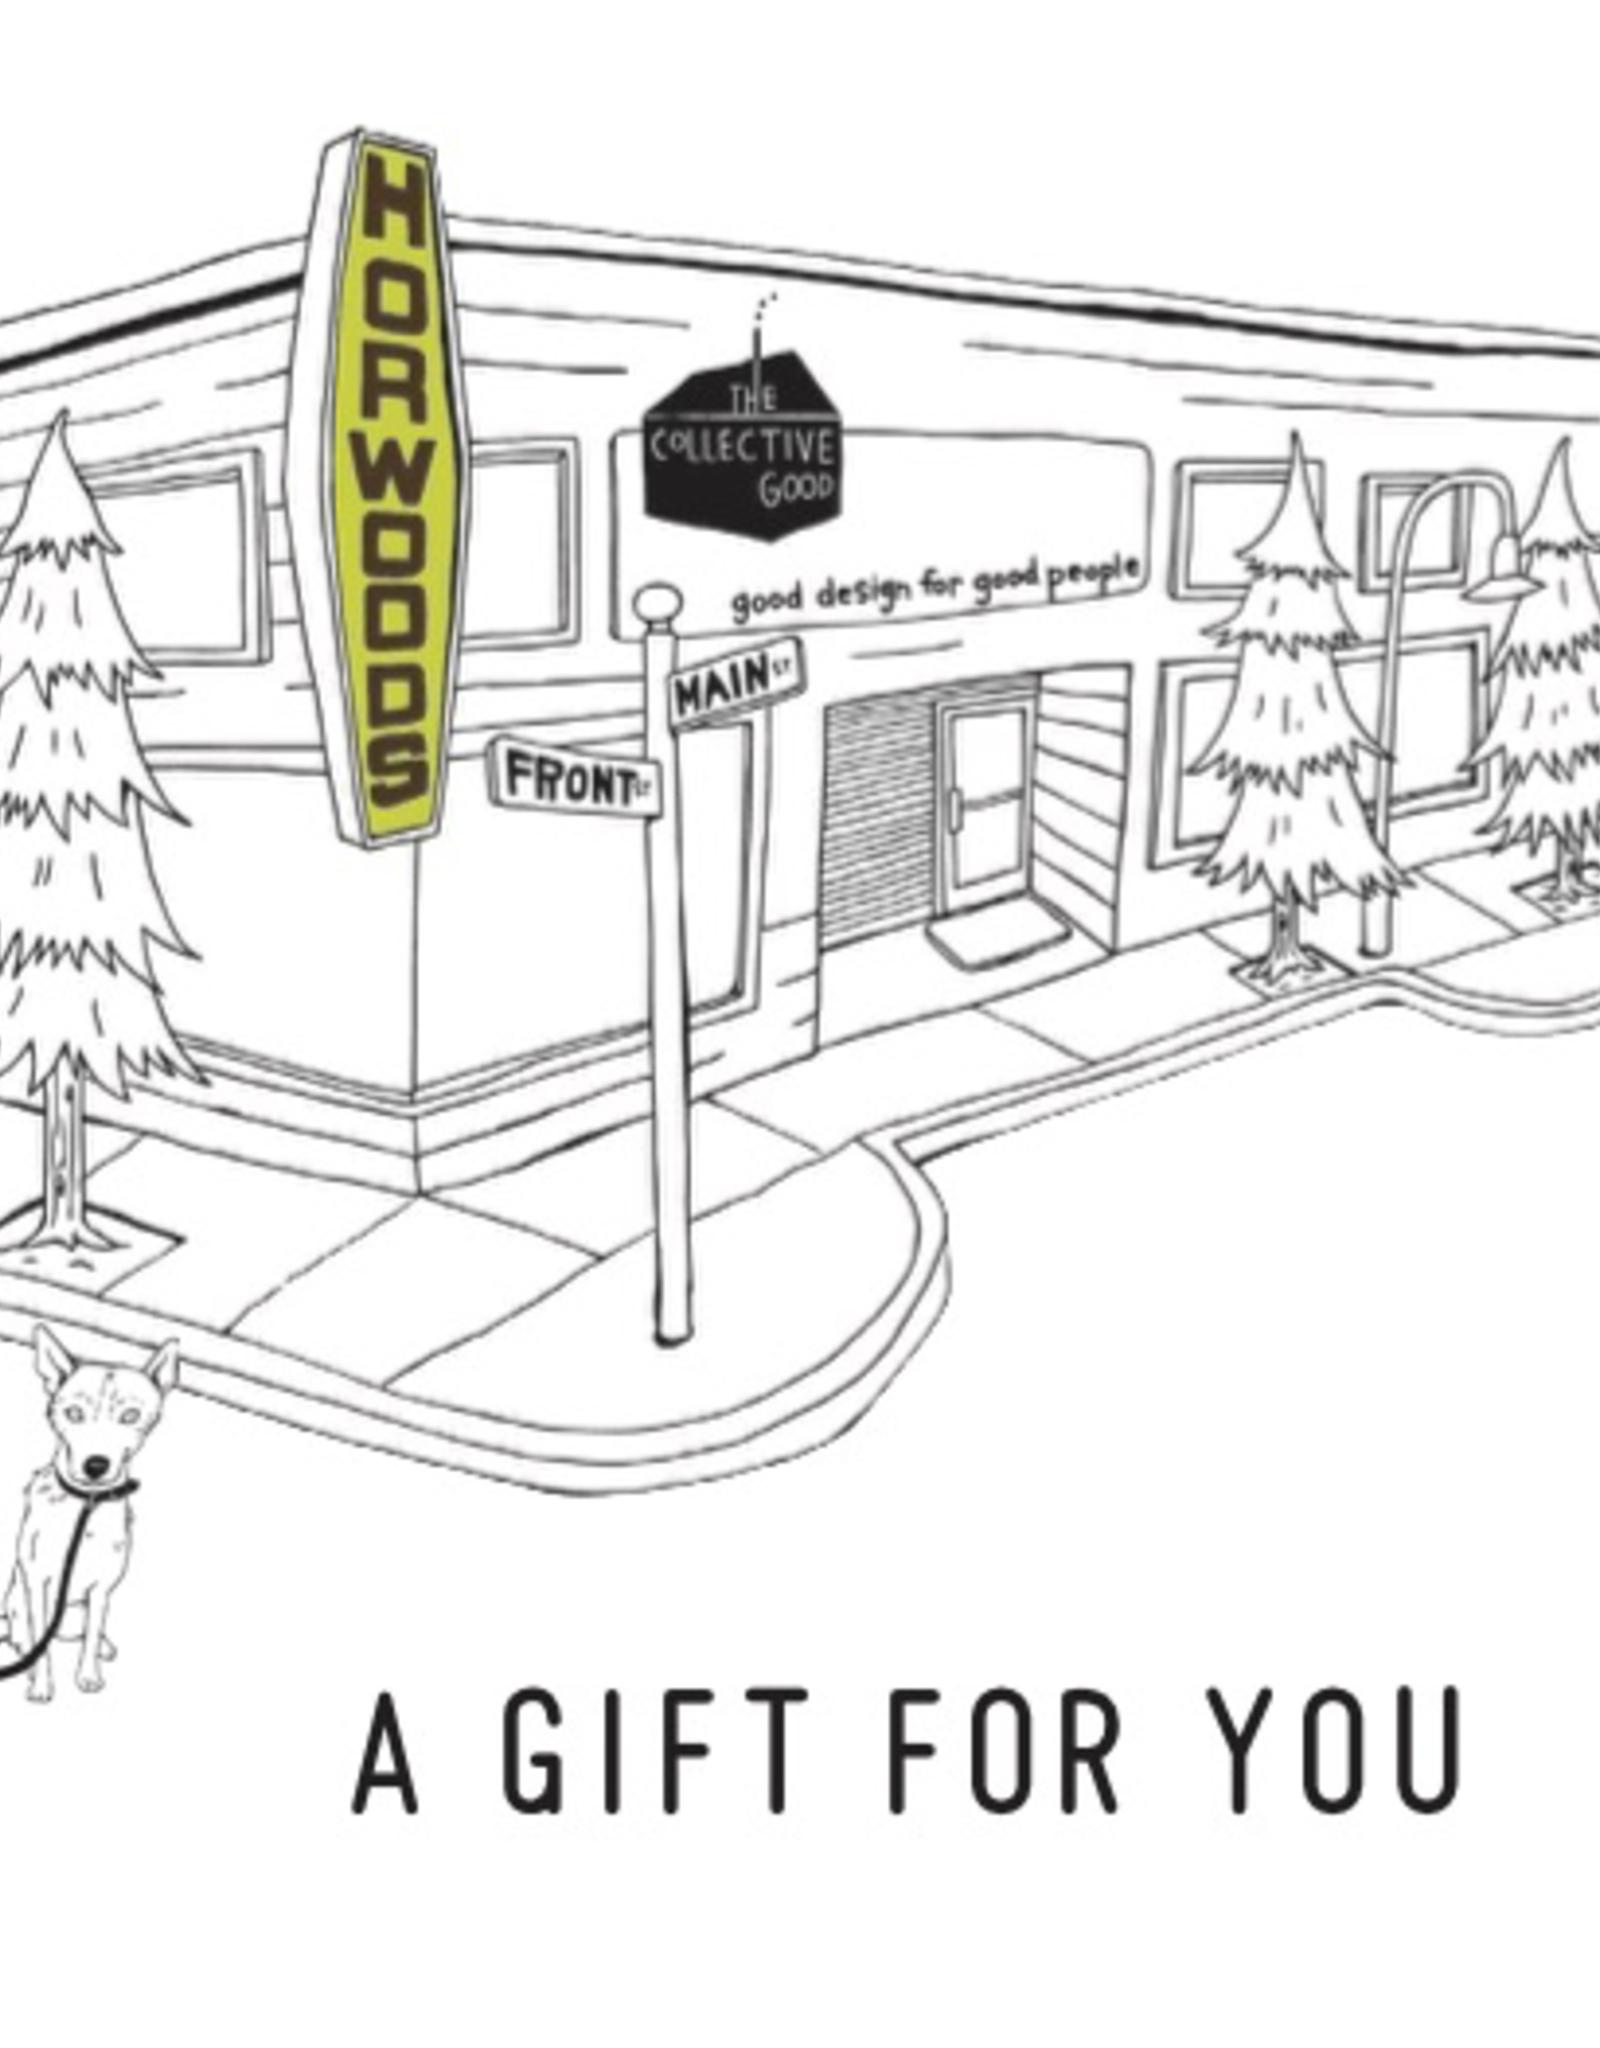 TCG The Collective Good Gift Card - $100